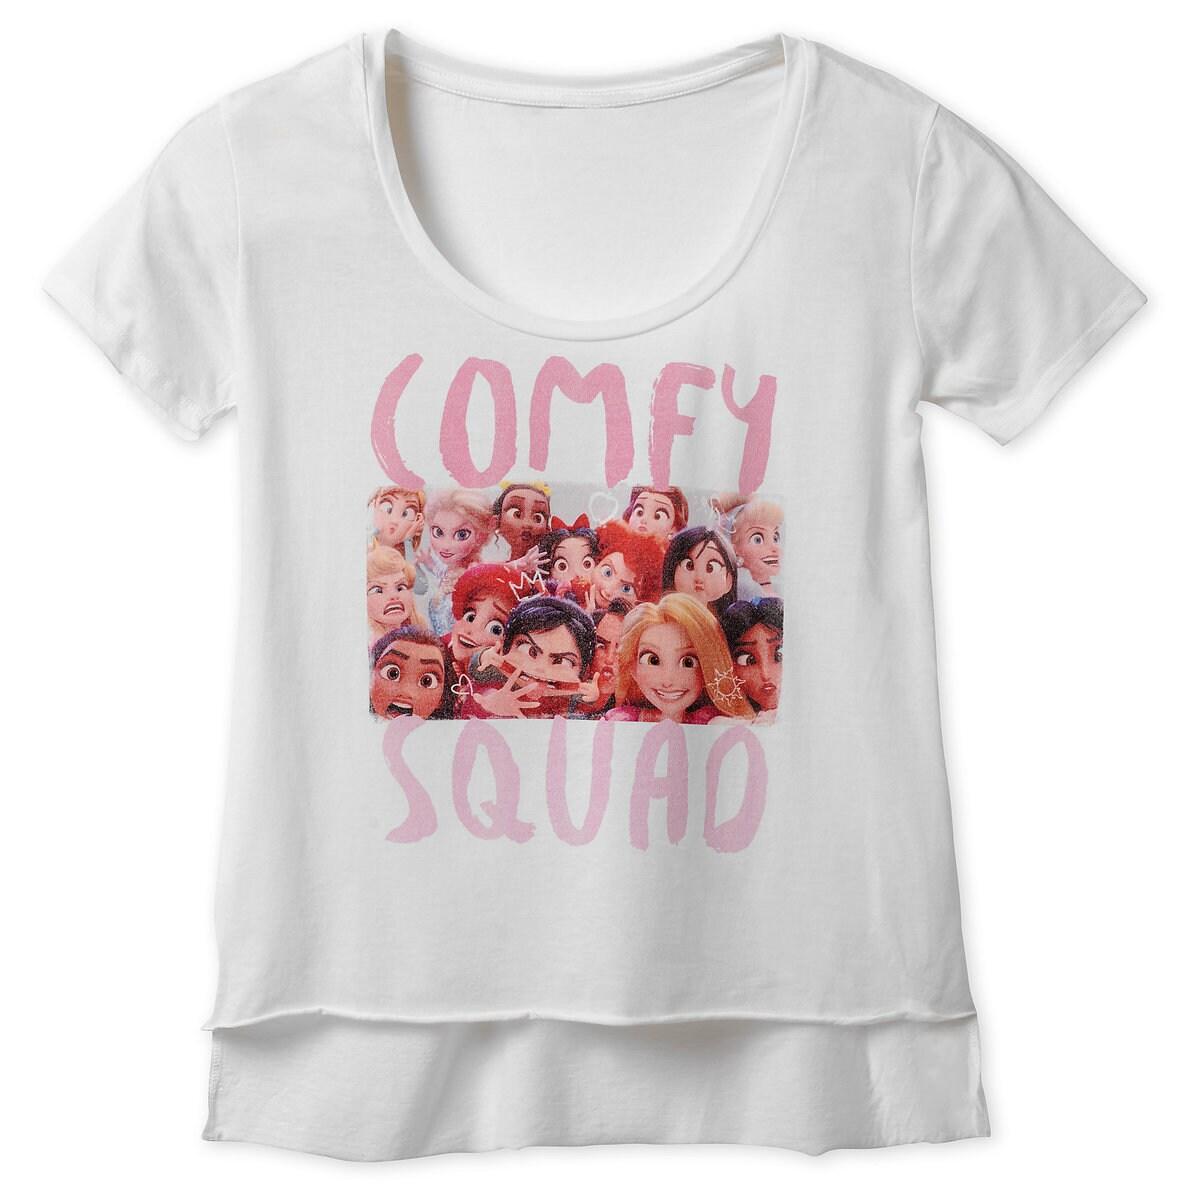 124cbeccda2ca Product Image of Vanellope and Disney Princesses ''Comfy Squad'' T-Shirt